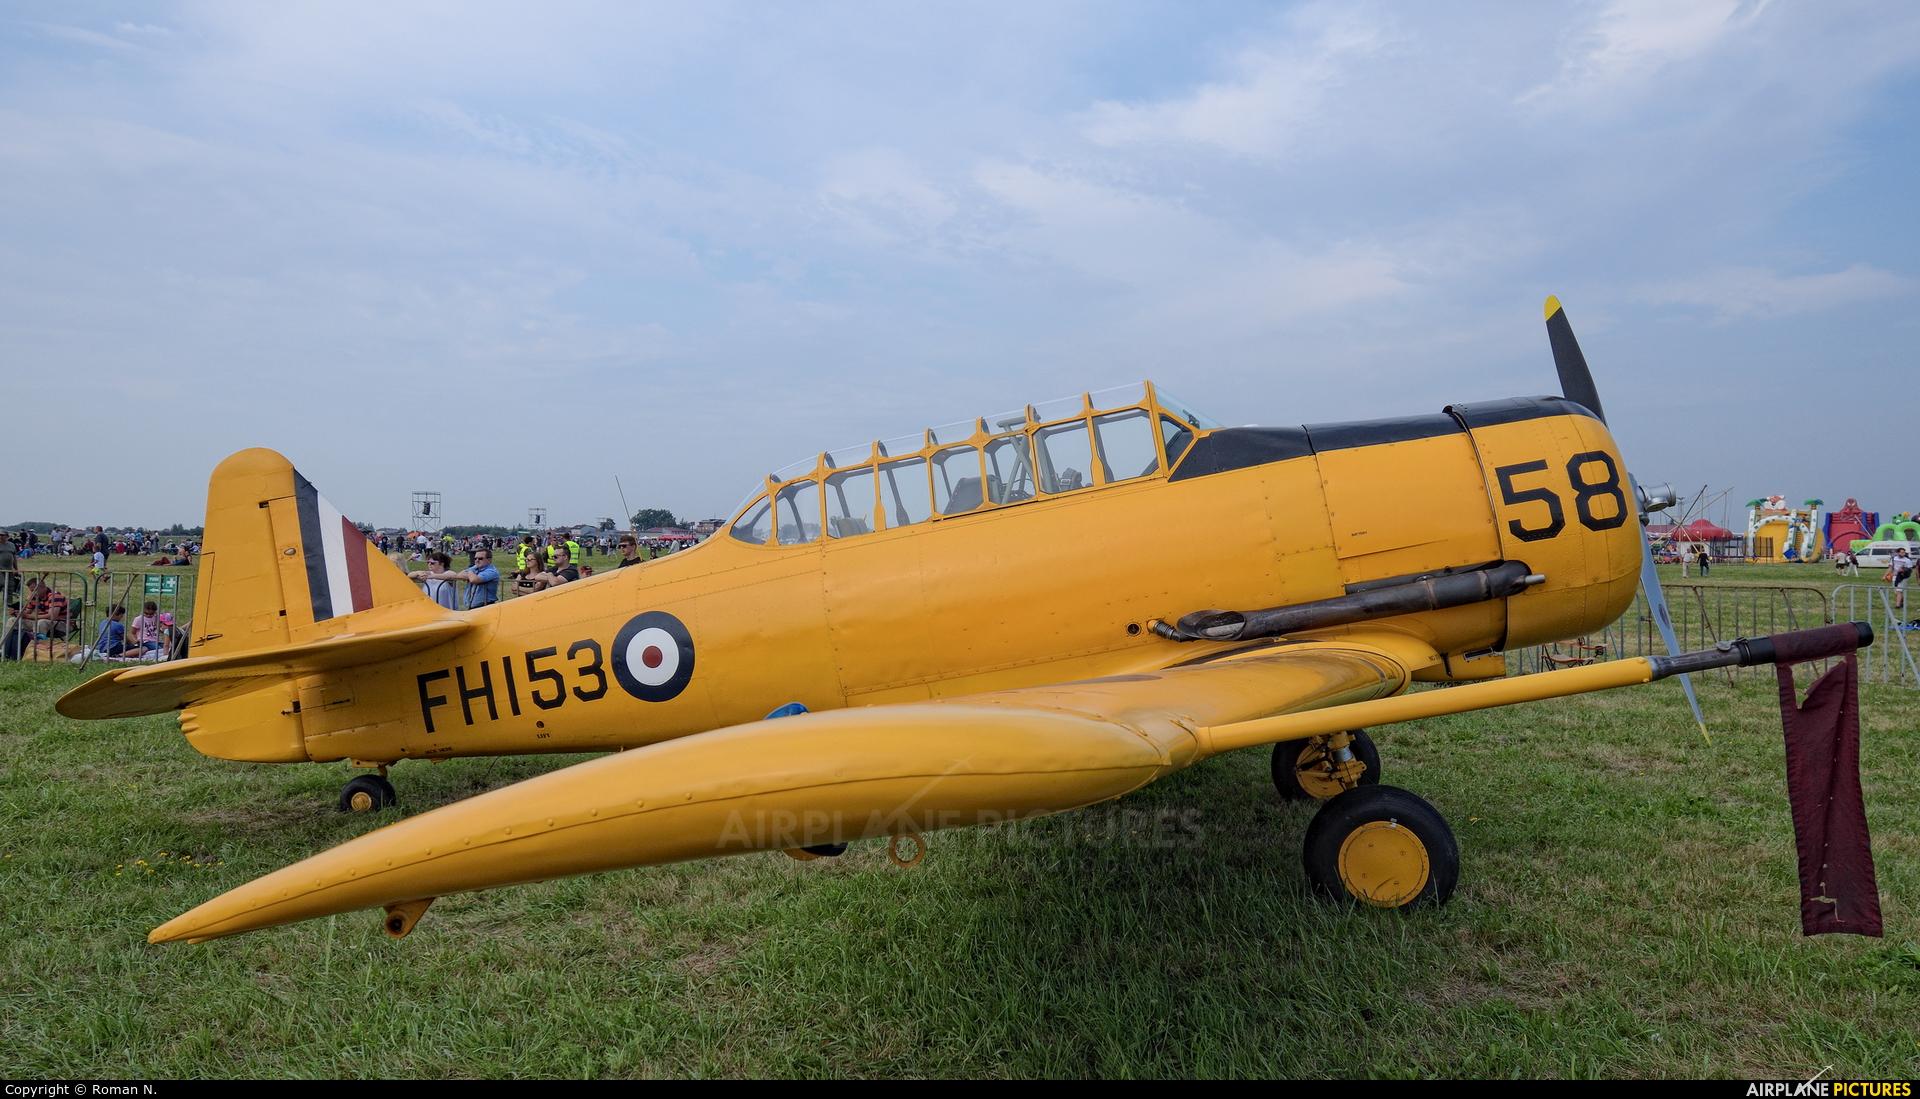 Private FH153 aircraft at Radom - Sadków